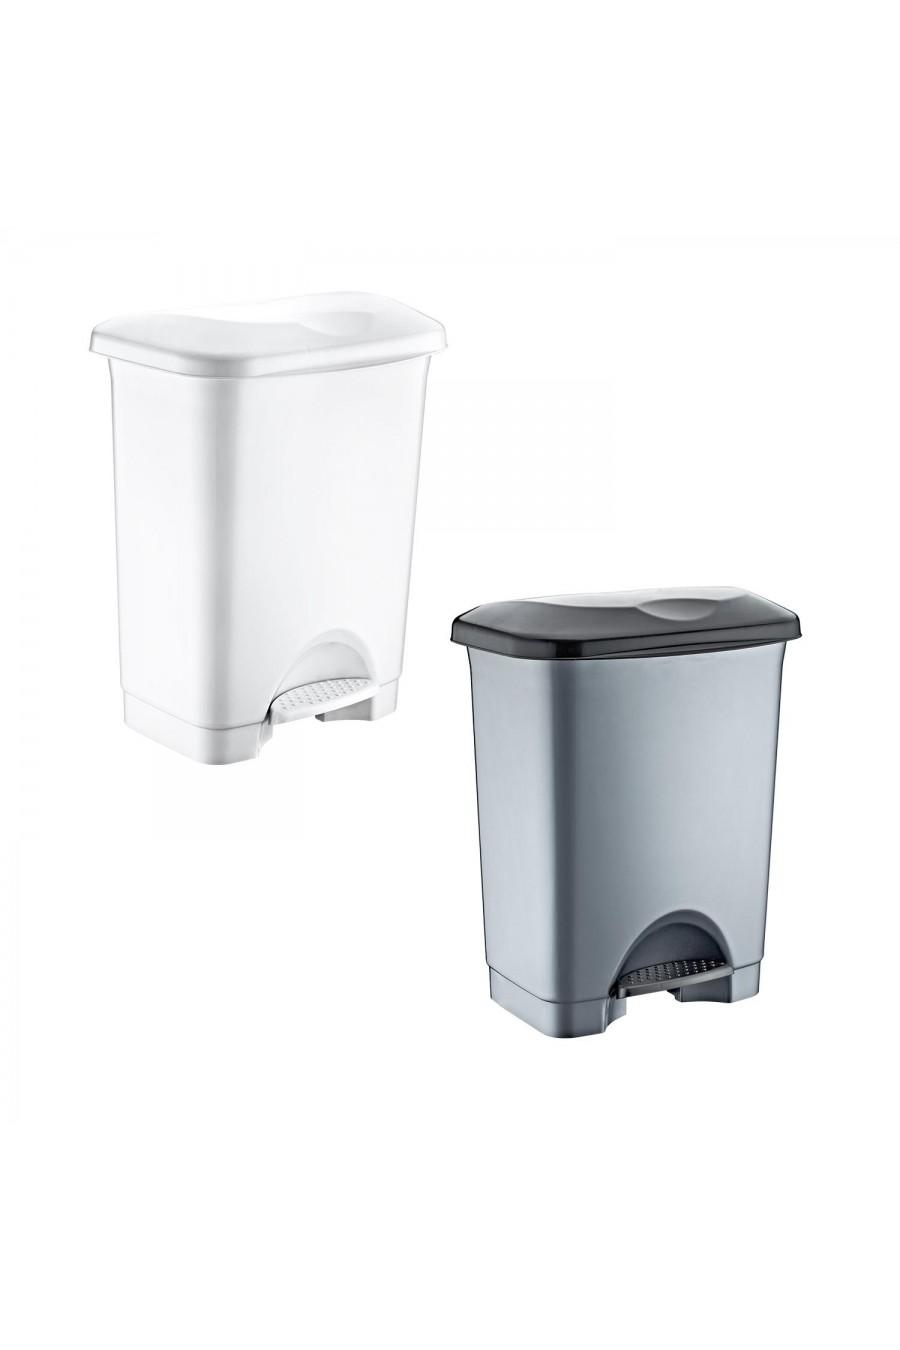 PlastArt 45 lt. Pedallı İç Kovalı Çöp Kovası